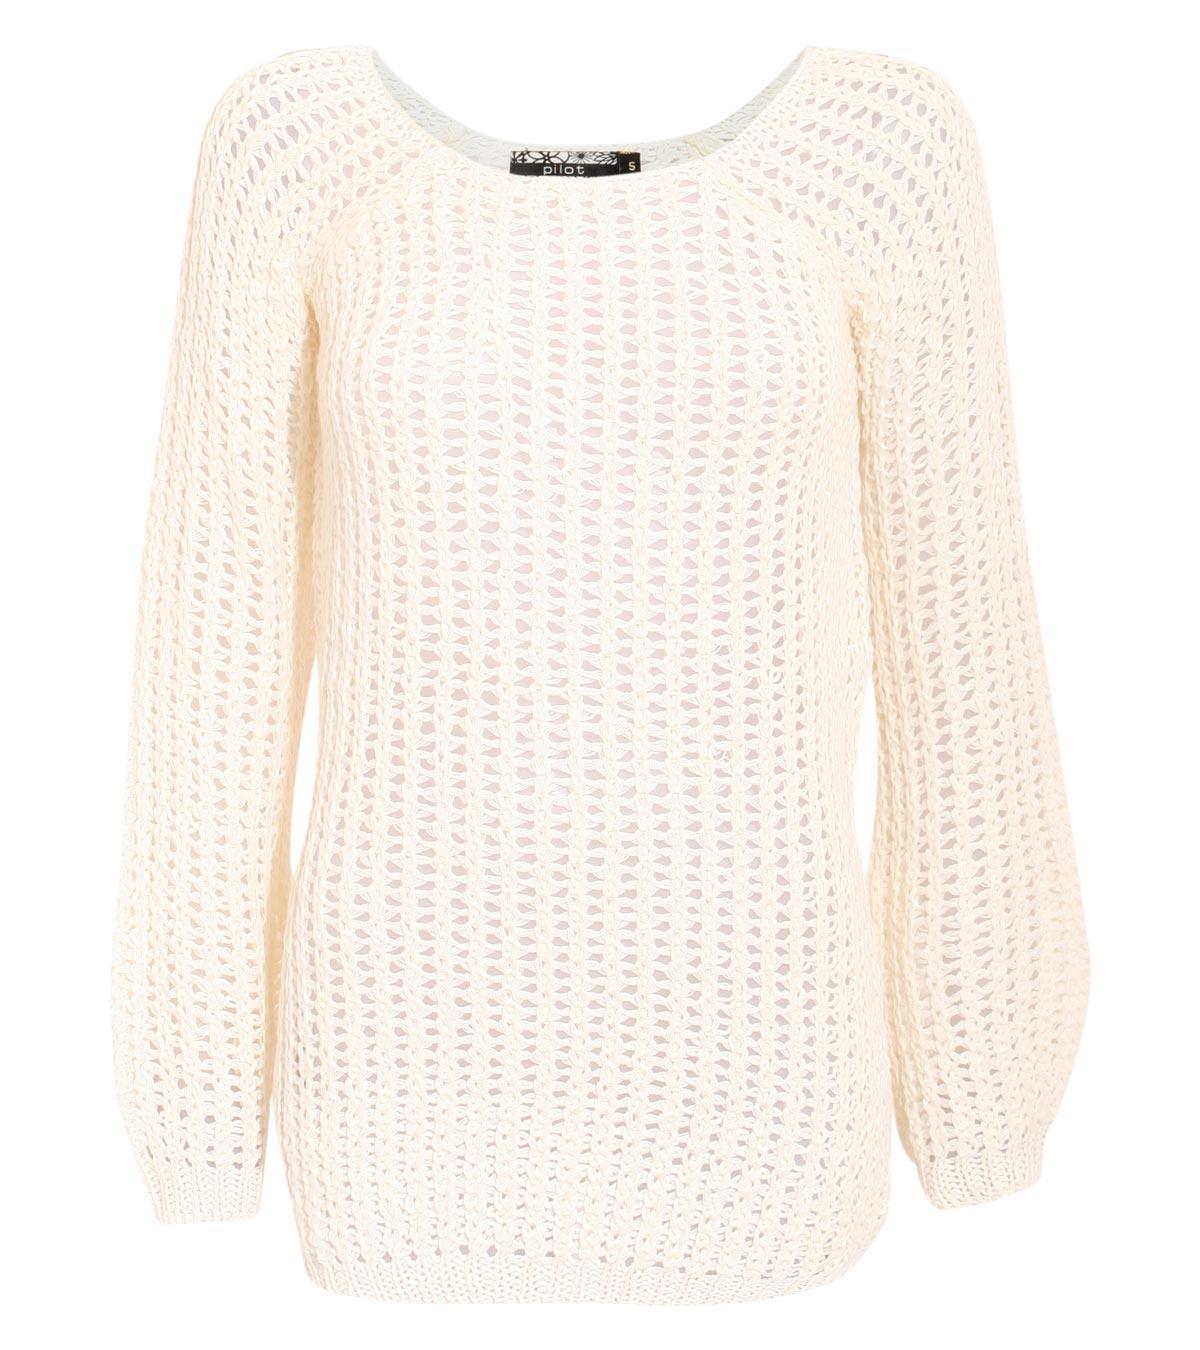 Pilot emma open knit jumper sweater in cream